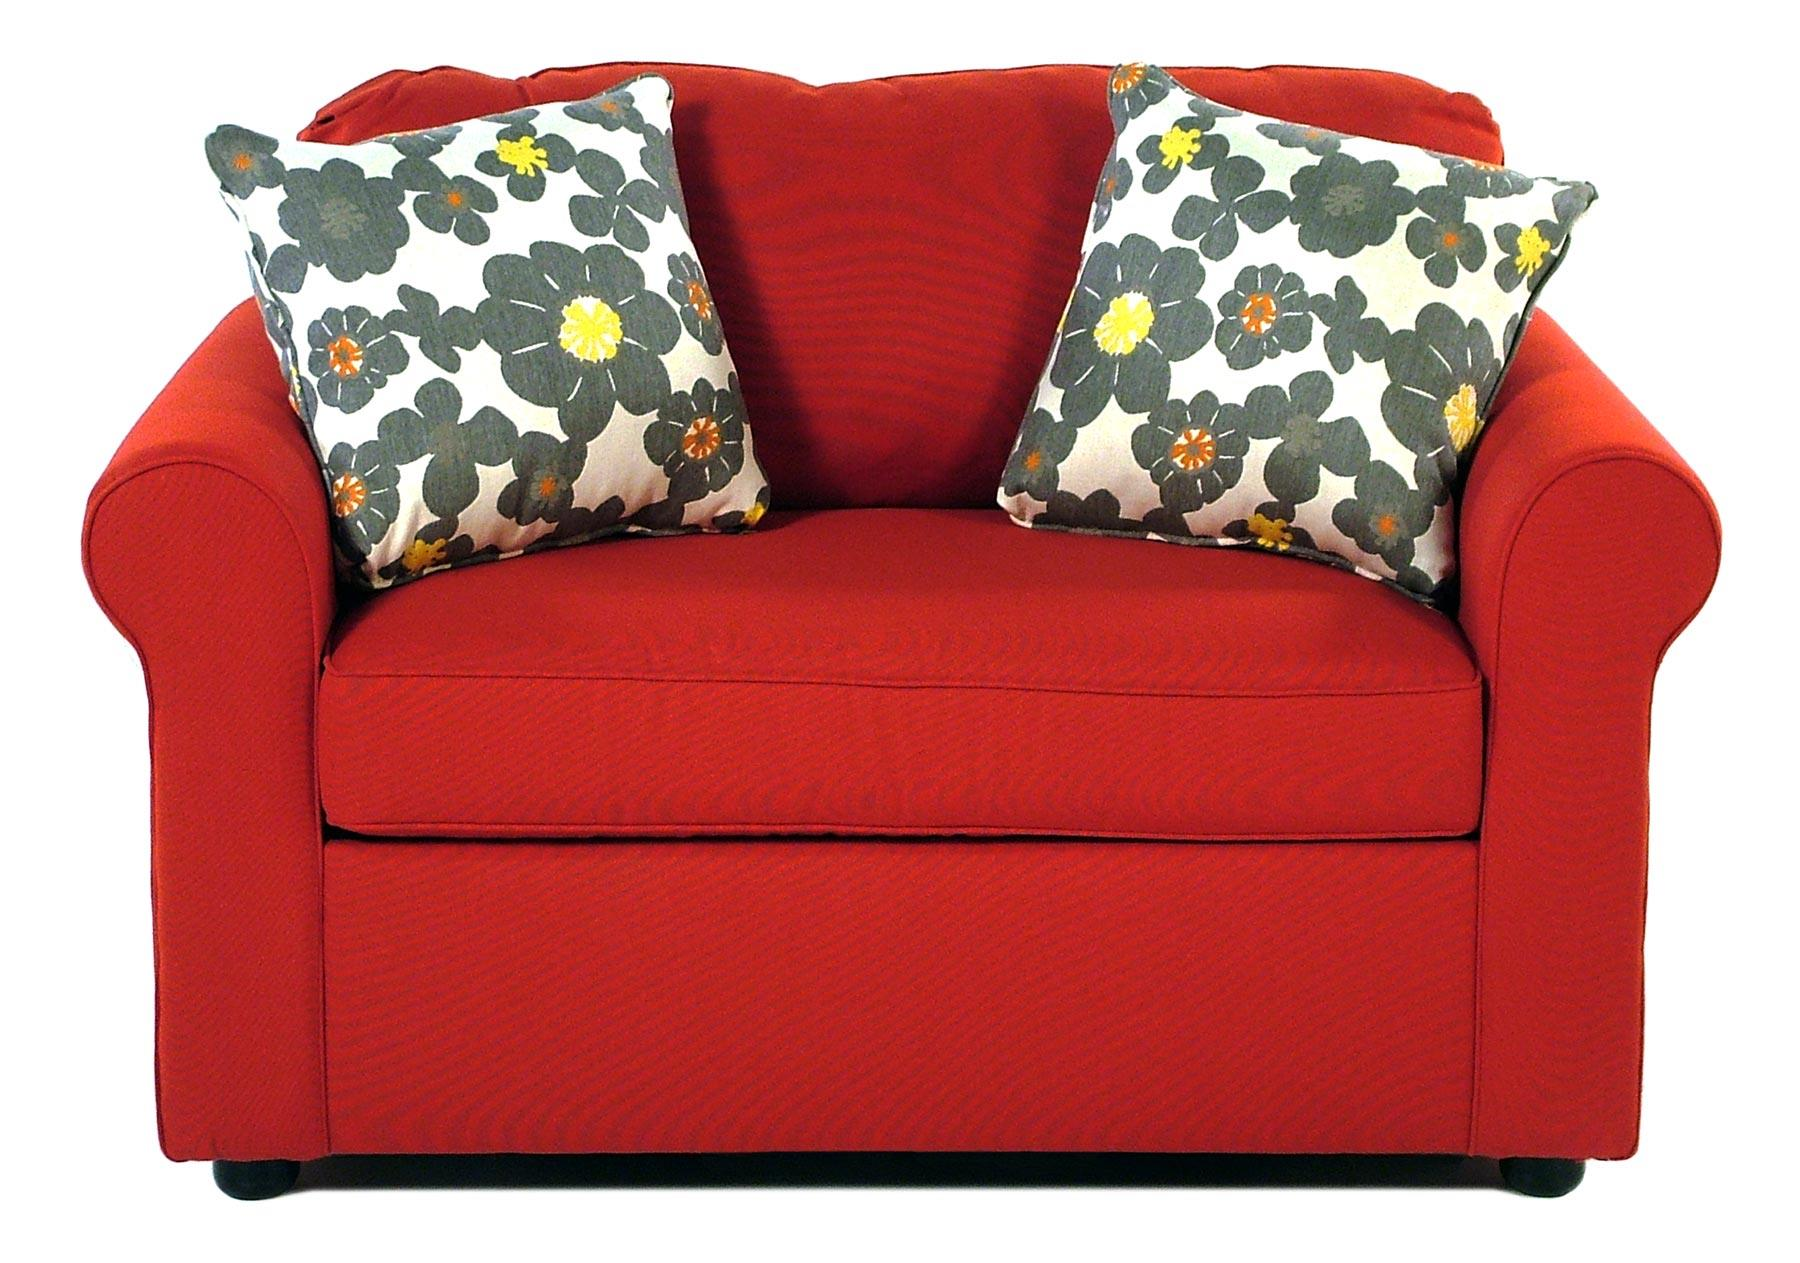 Simple Elegance Sunburst Dreamquest Chair Sleeper - Item Number: 24900DCSL